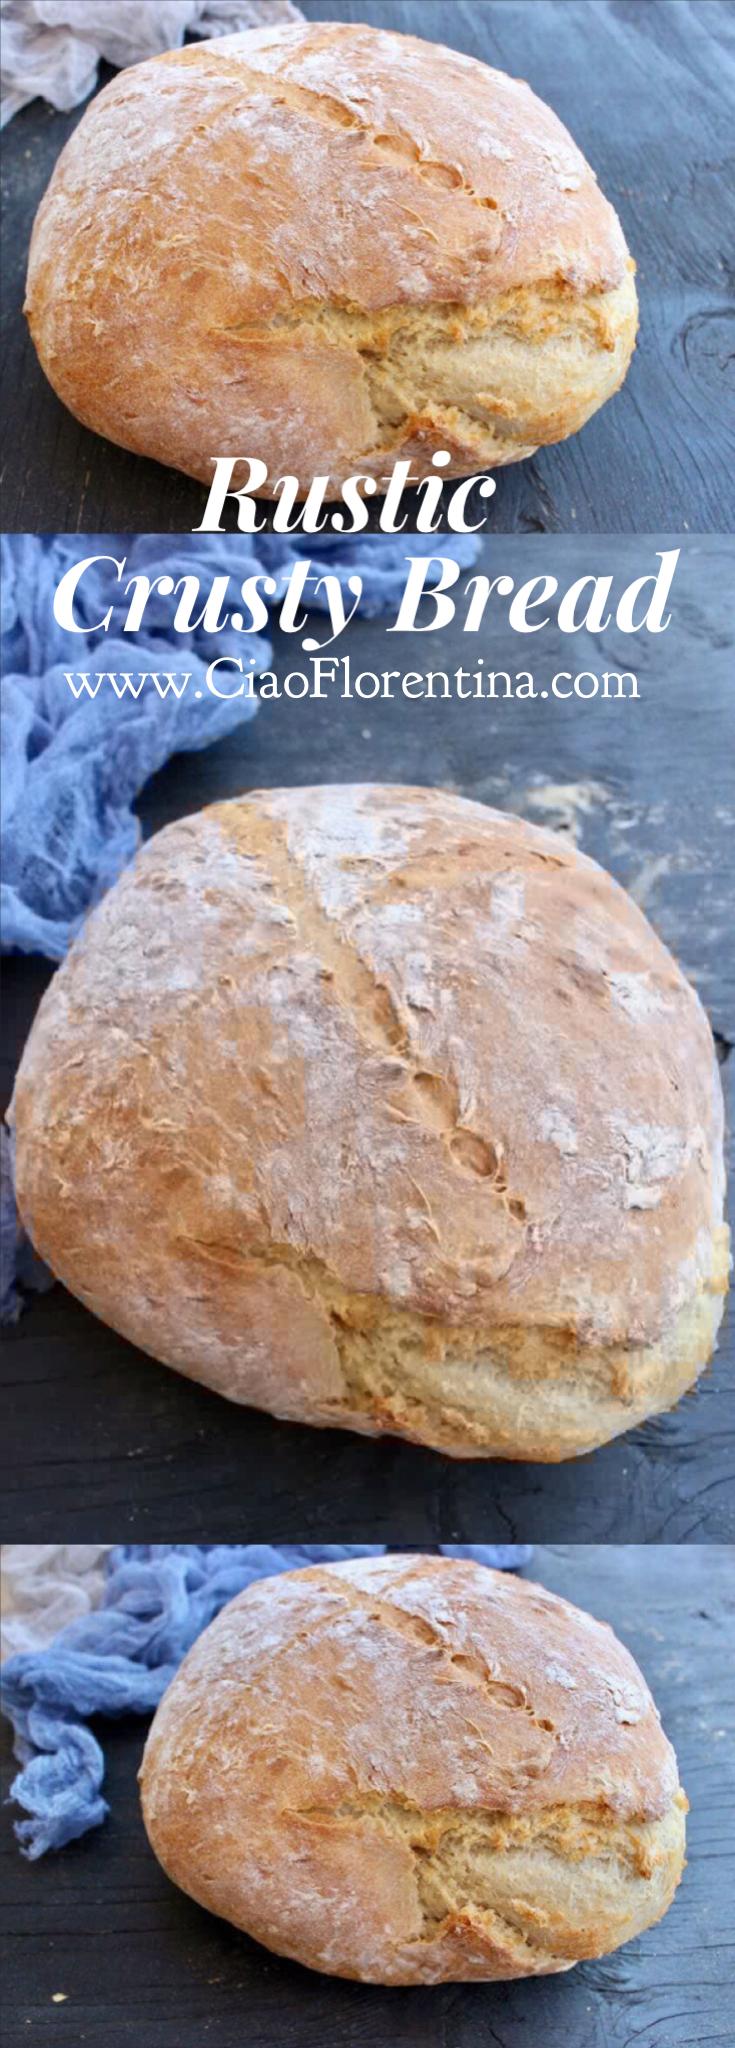 Rustic Crusty Bread Recipe Food Recipes Cooking